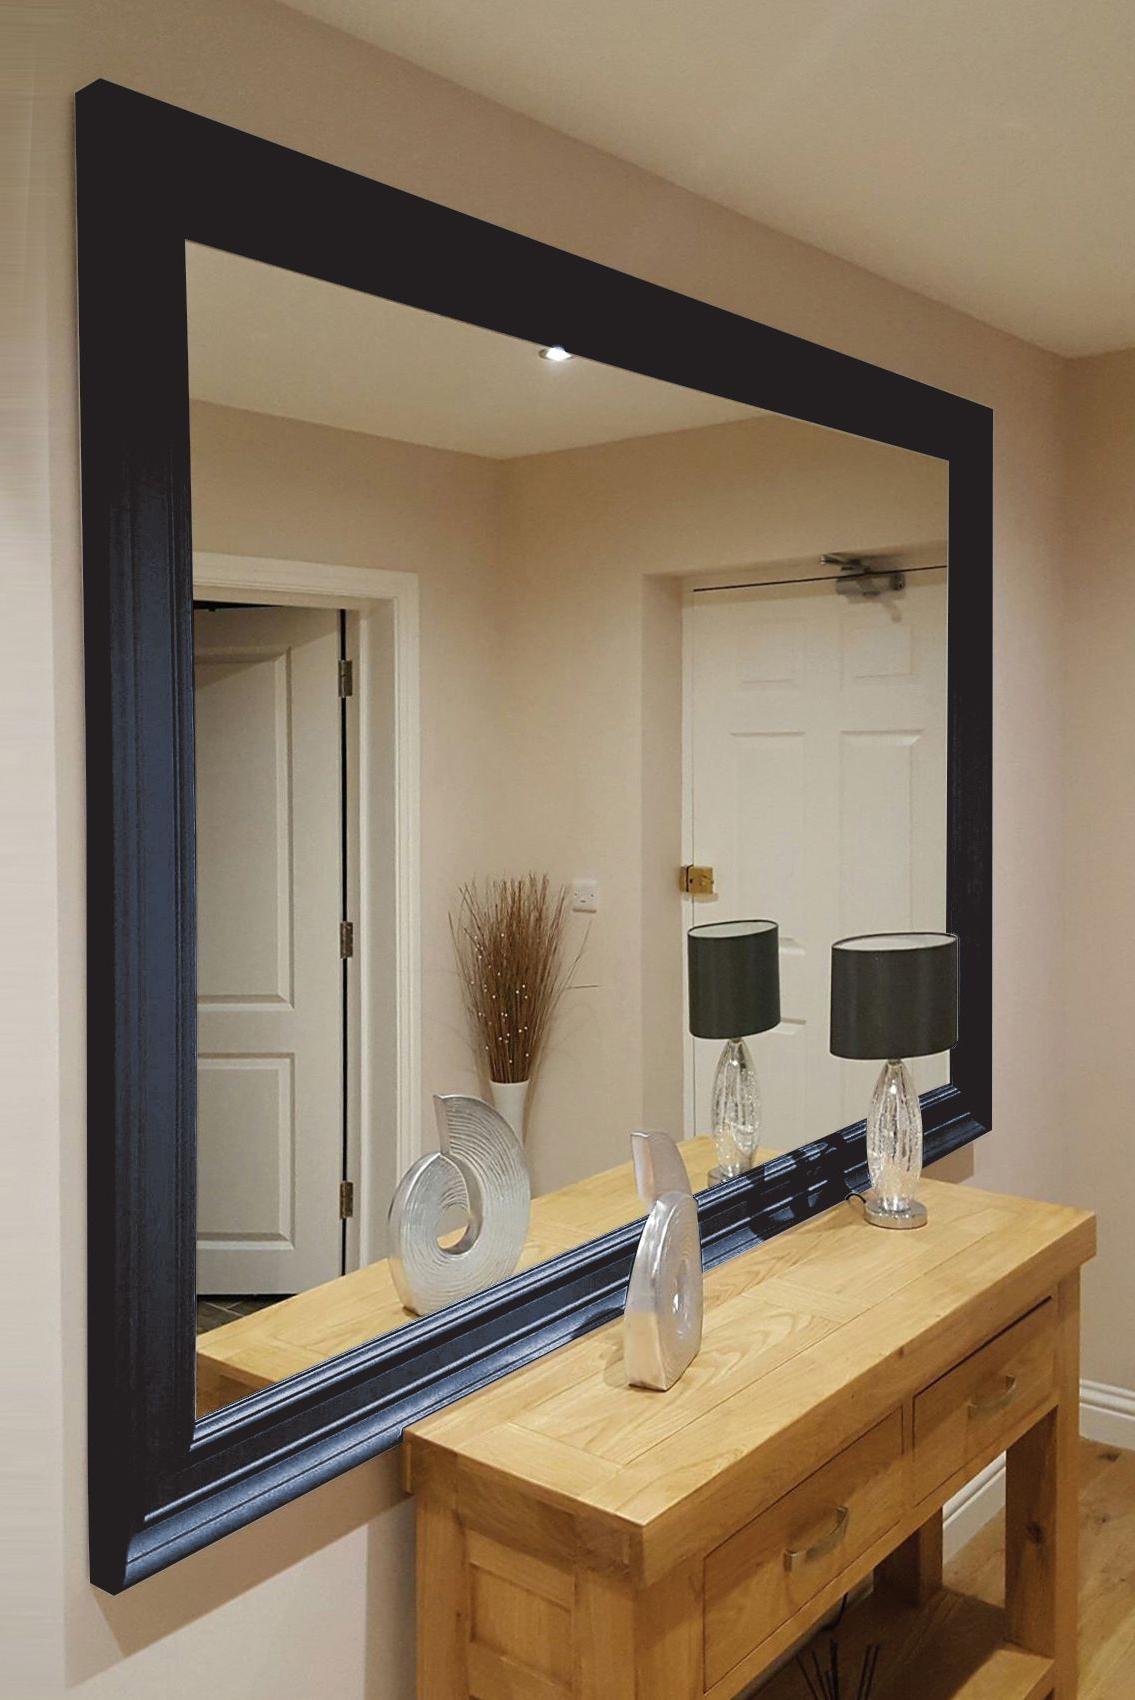 Latest Large Modern Oxford Black Wall Mirror 206X145Cm In 2019 With Large Black Wall Mirrors (Gallery 3 of 20)